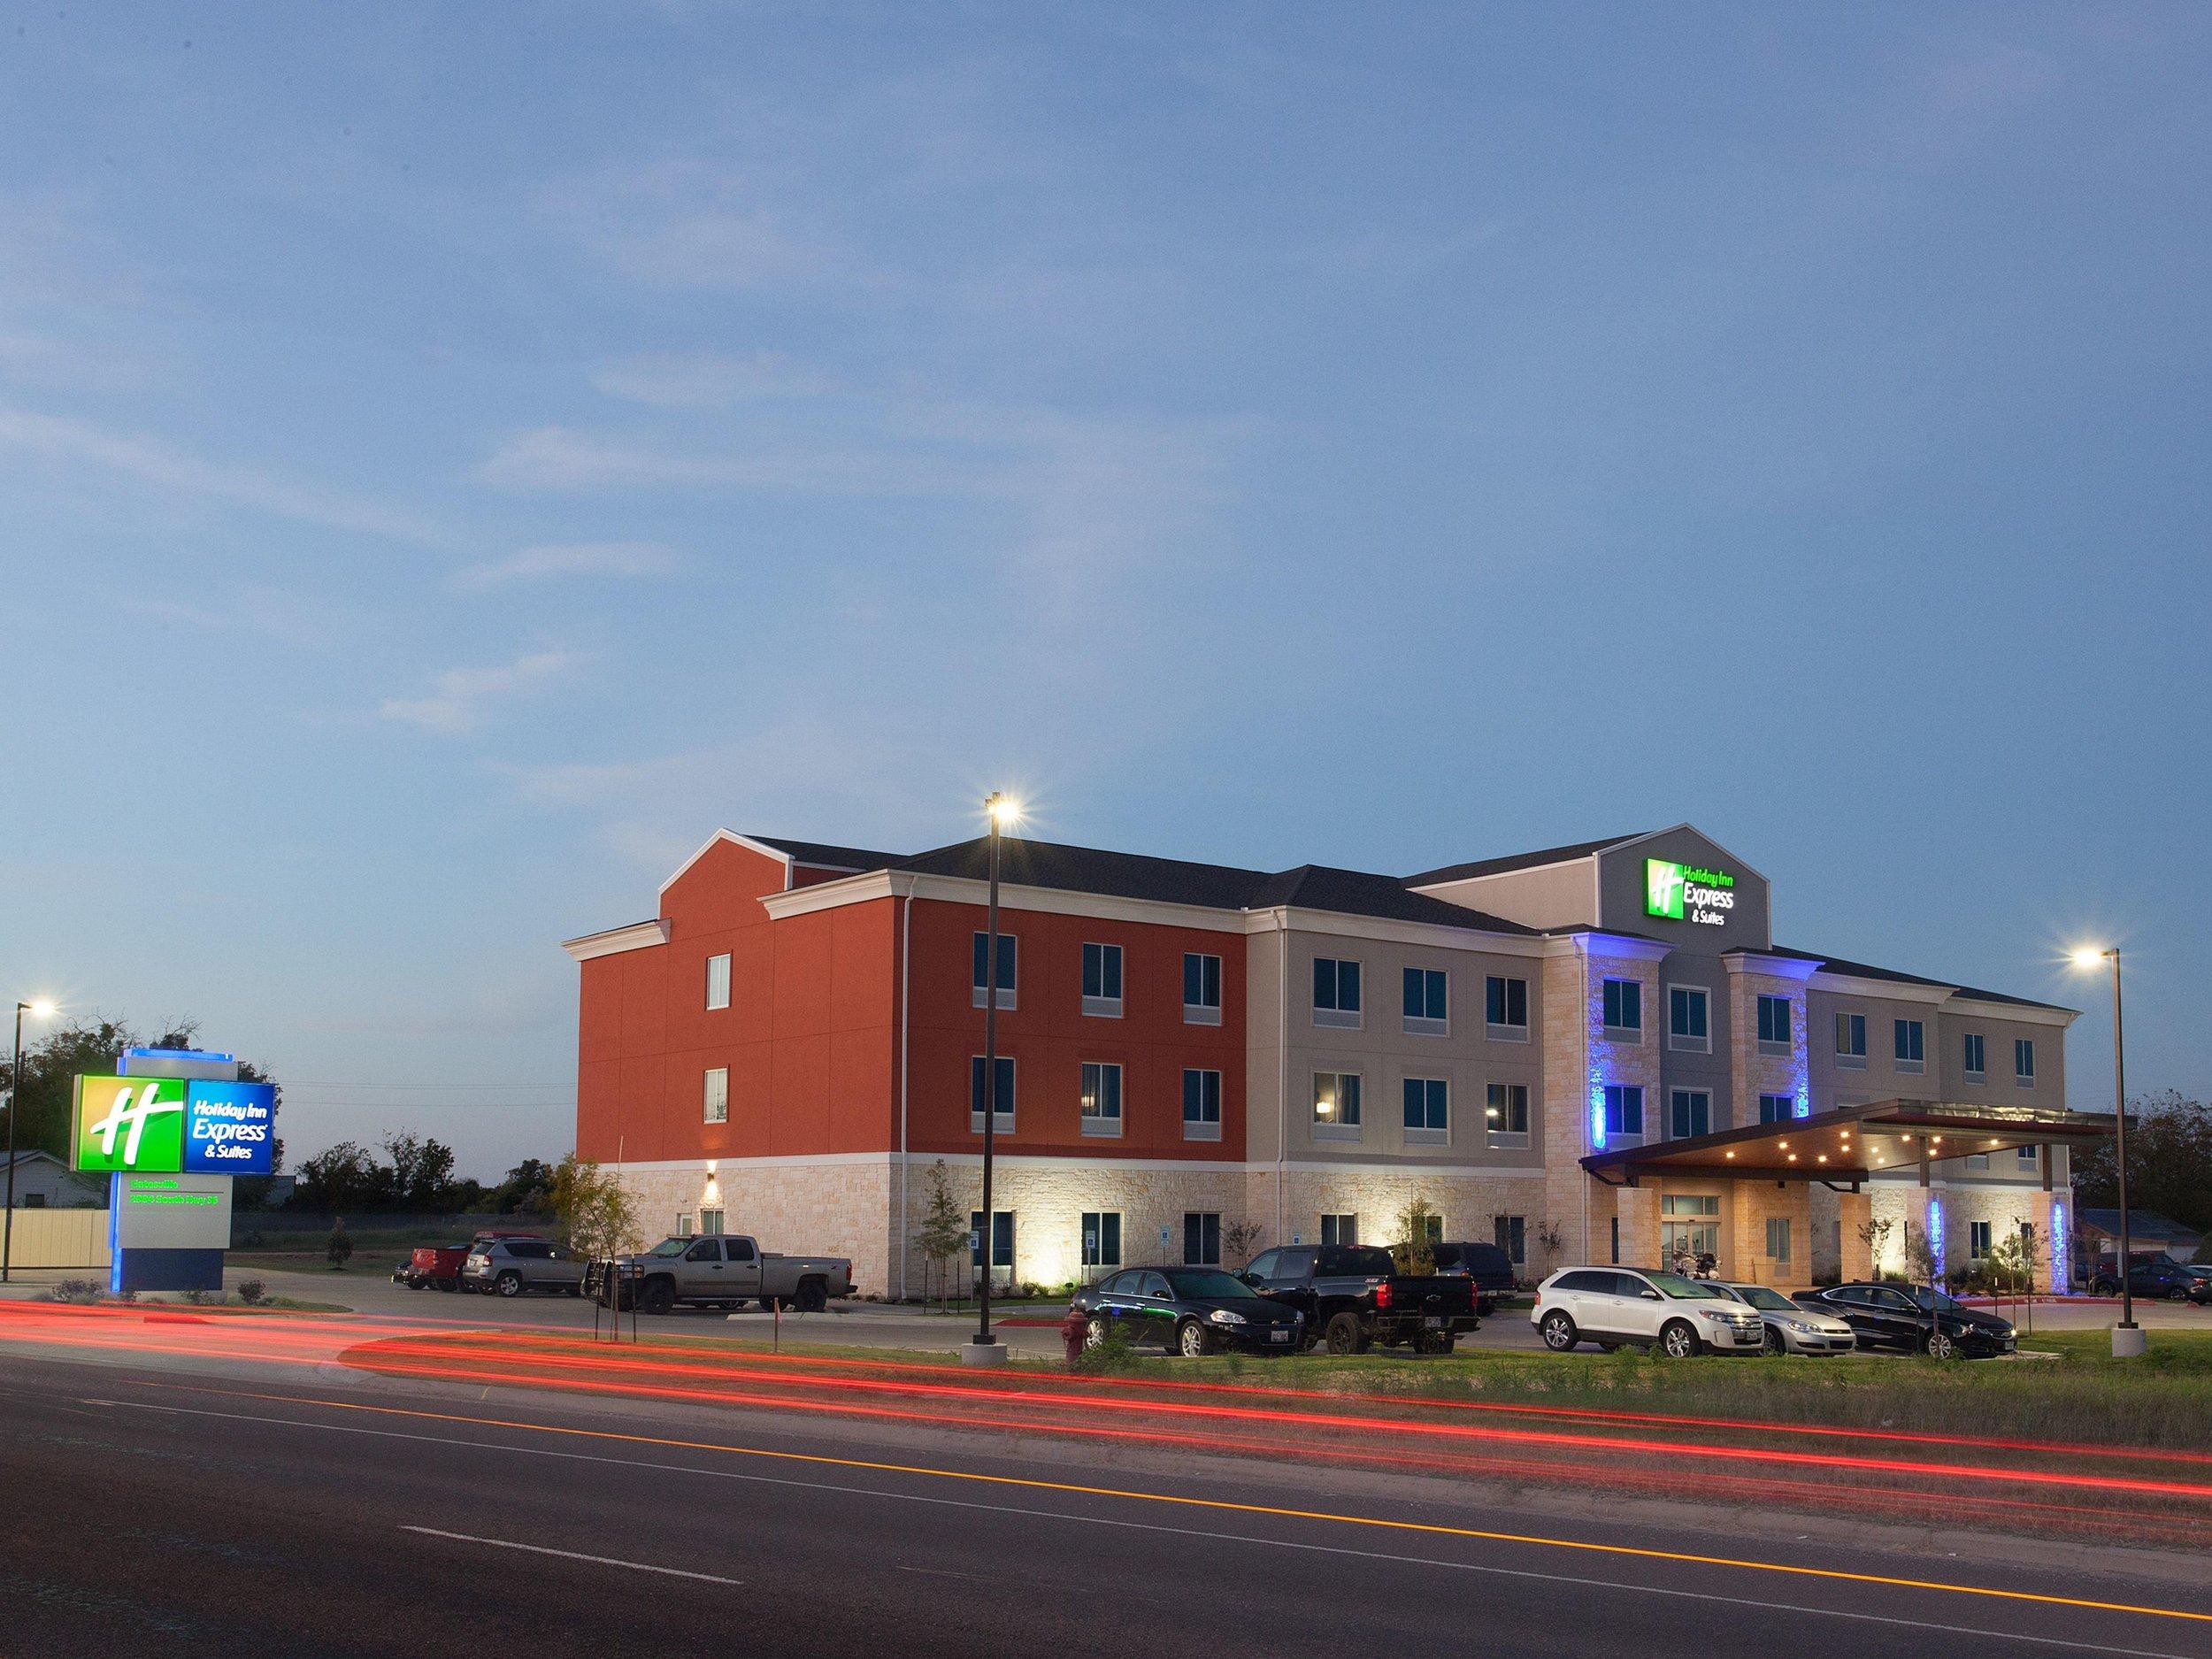 Holiday Inn Express - Address:South, 2904 TX-36, Gatesville, TX, 76528Phone:(254) 404-9121